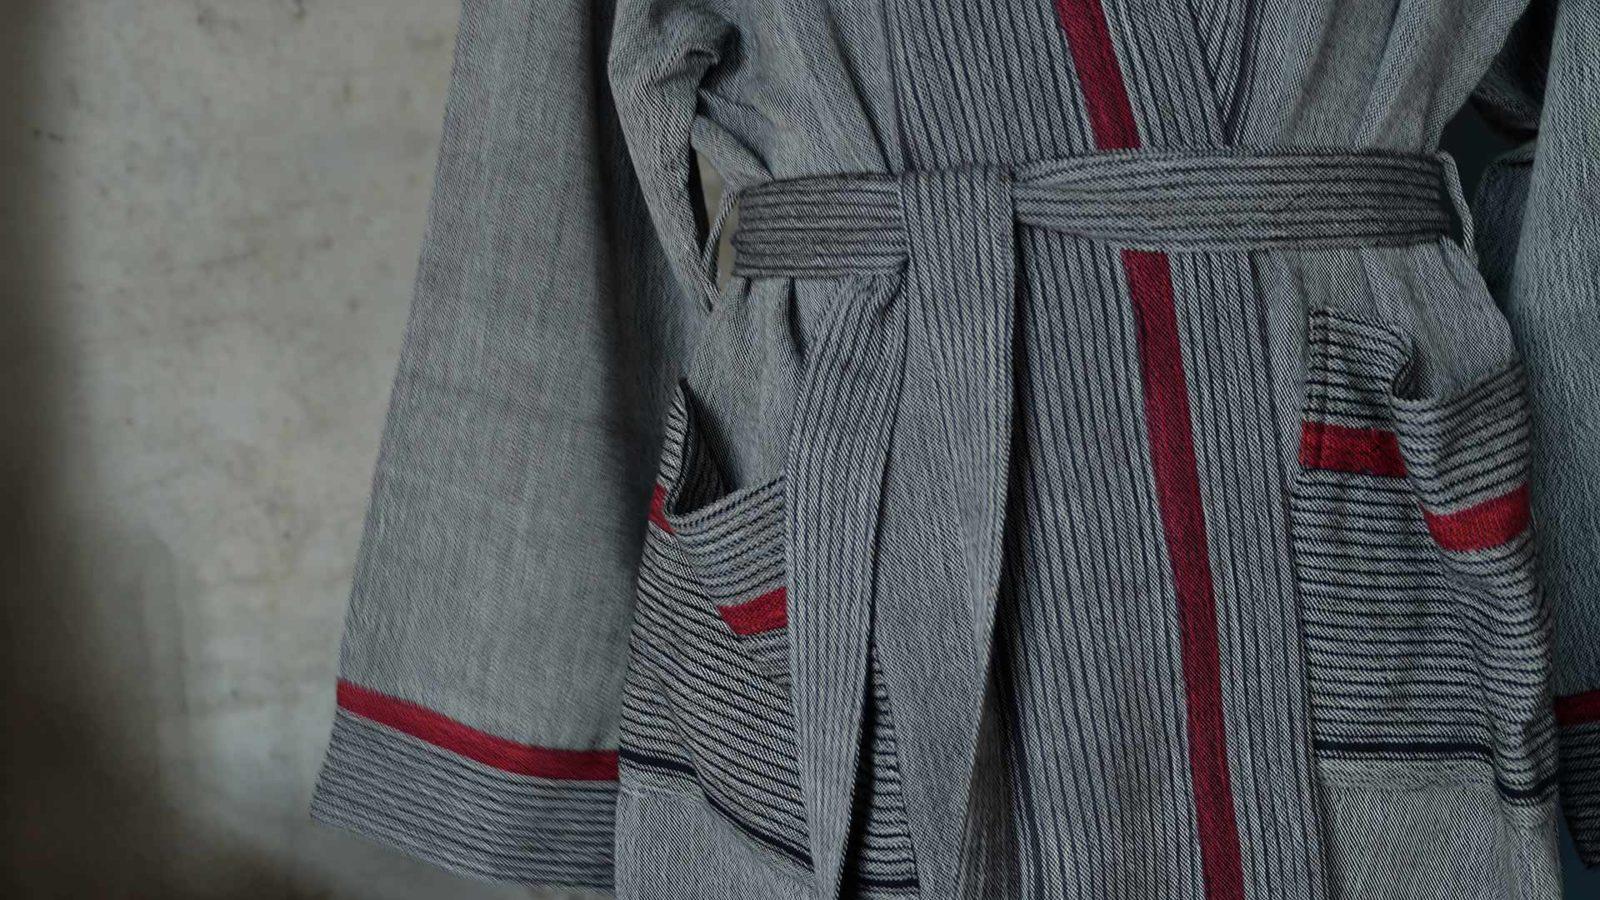 grey striped soft cotton robe a closer view